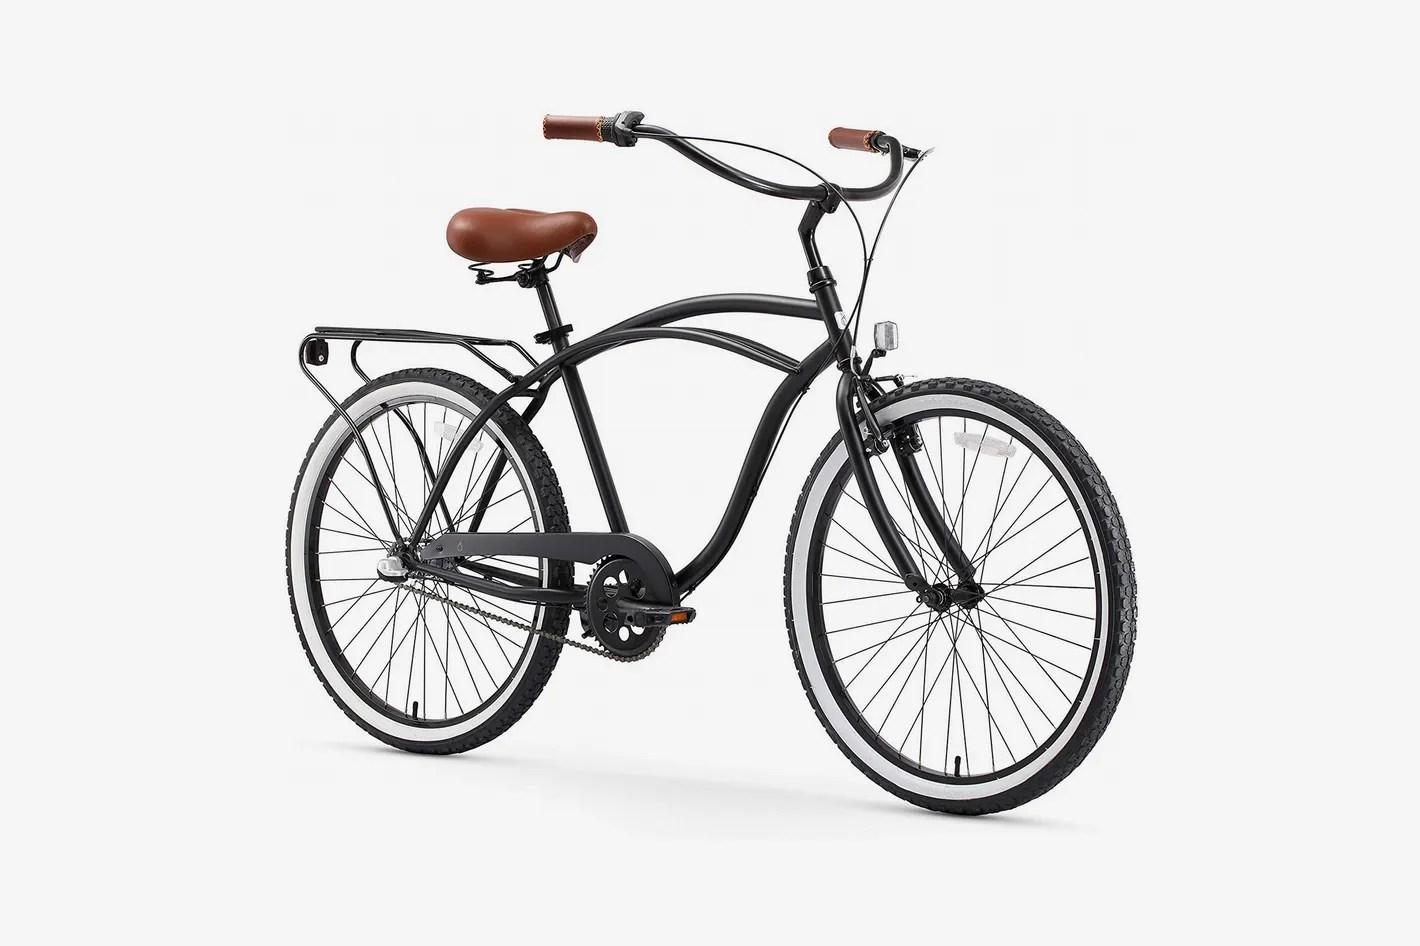 Top 10 Cruiser Bike Brands